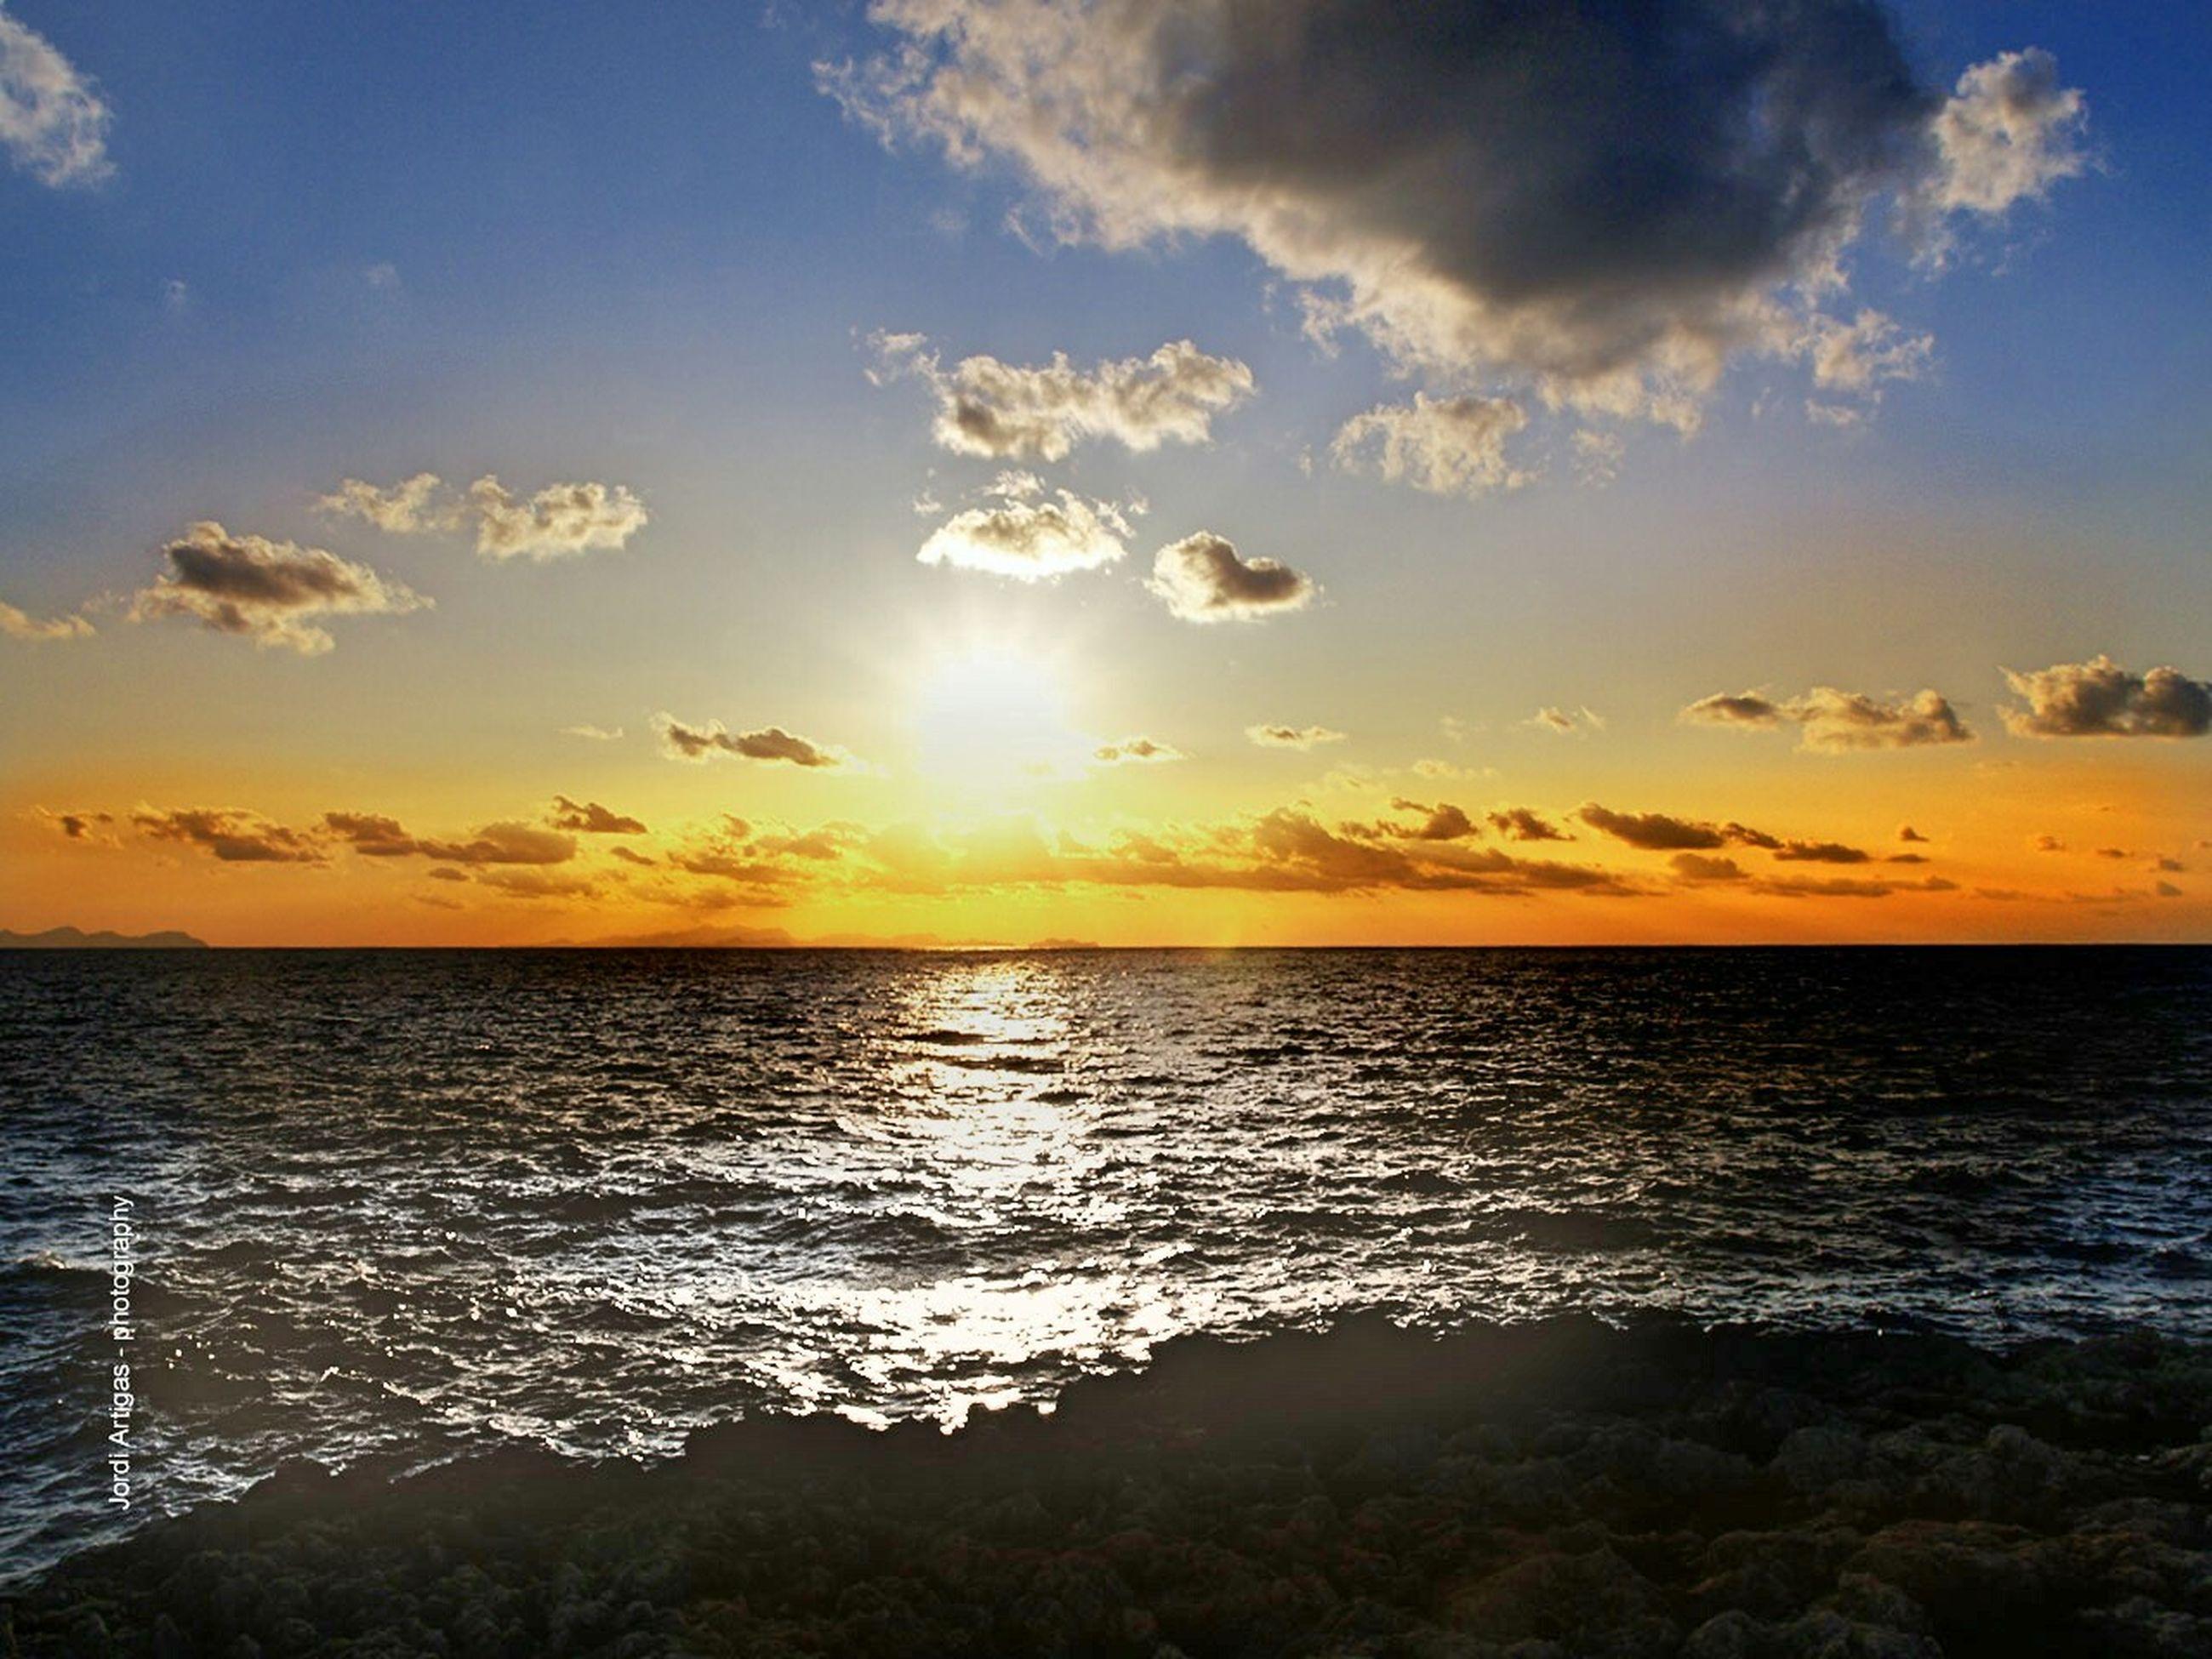 sea, horizon over water, water, sunset, scenics, sky, tranquil scene, sun, beauty in nature, tranquility, cloud - sky, idyllic, reflection, nature, sunlight, cloud, sunbeam, orange color, seascape, waterfront